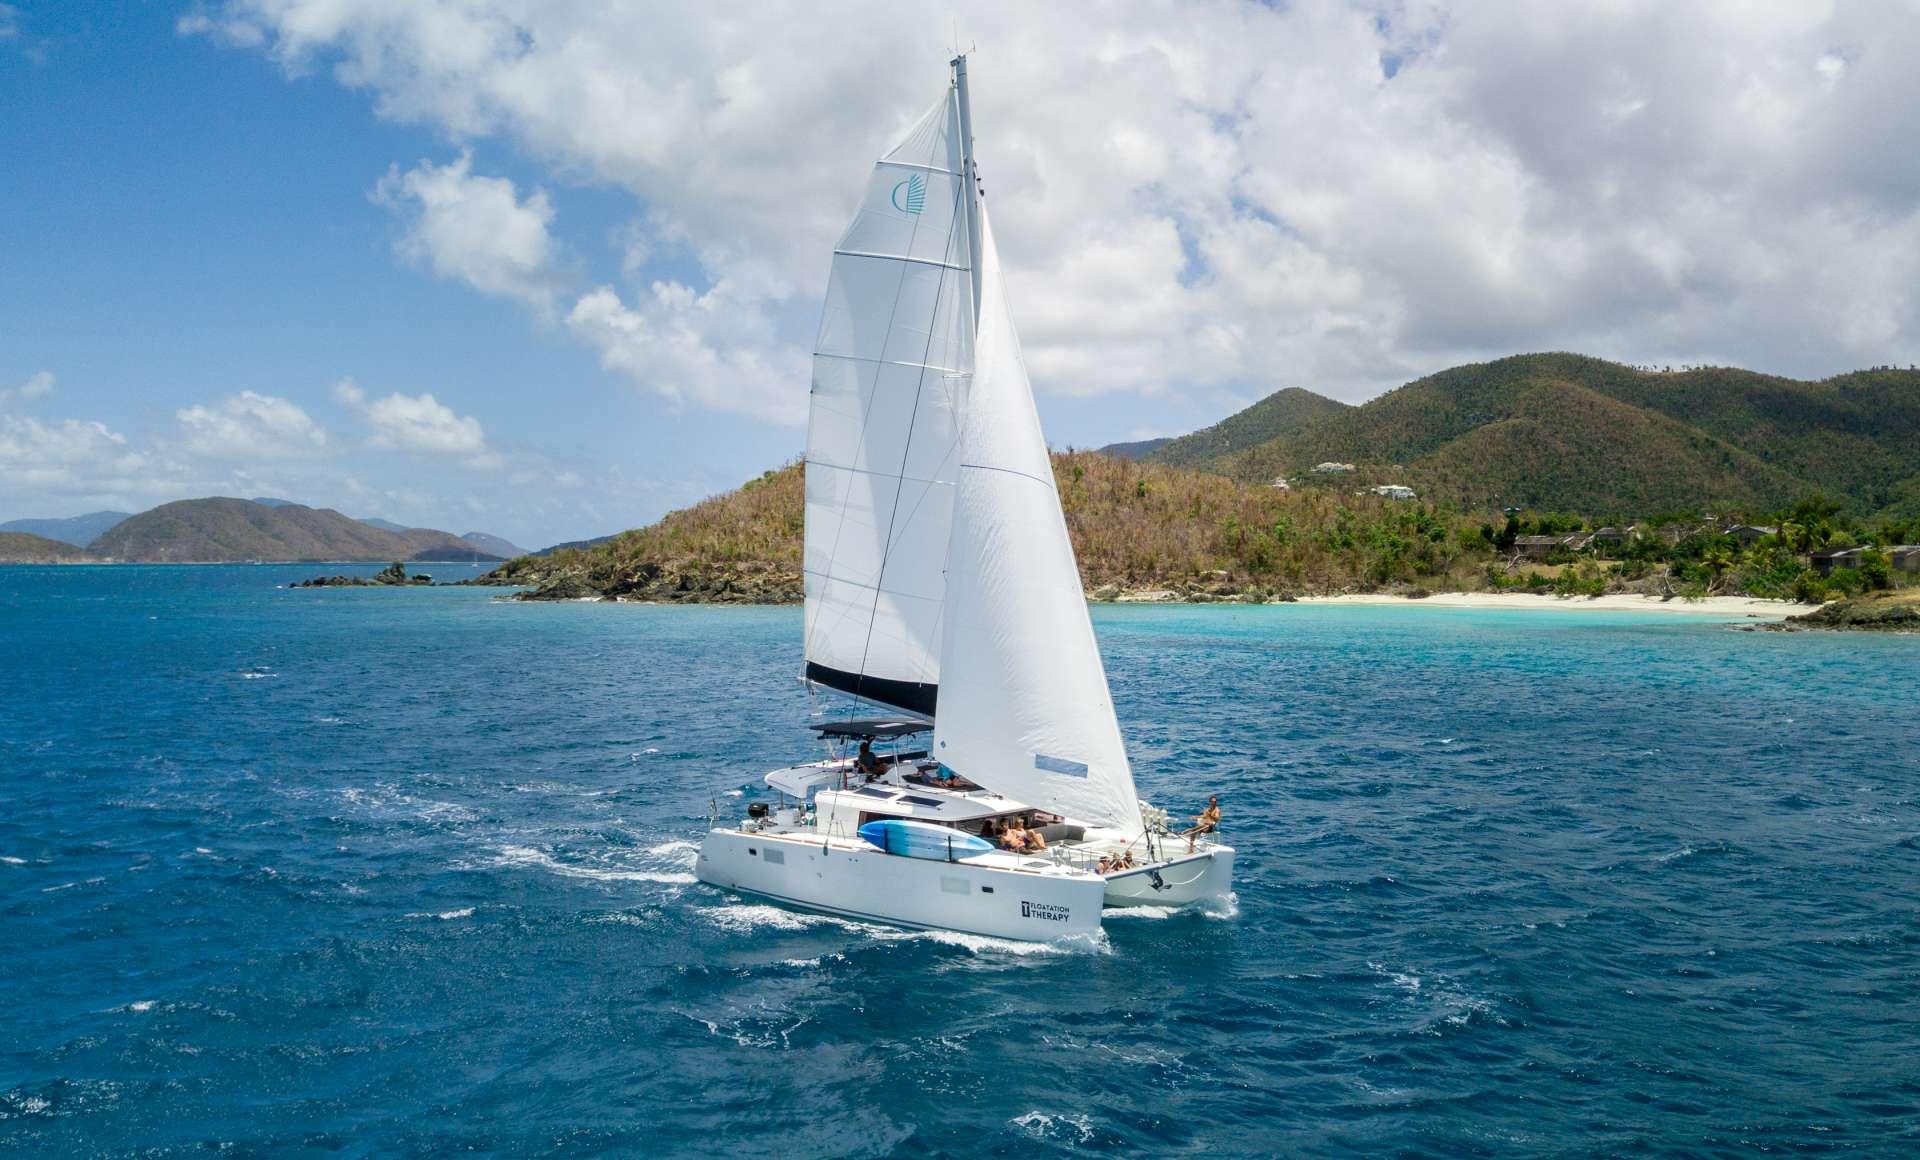 Cat Yacht 'Cat', 6 PAX, 2 Crew, 45.00 Ft, 13.00 Meters, Built 2018, Lagoon, Refit Year